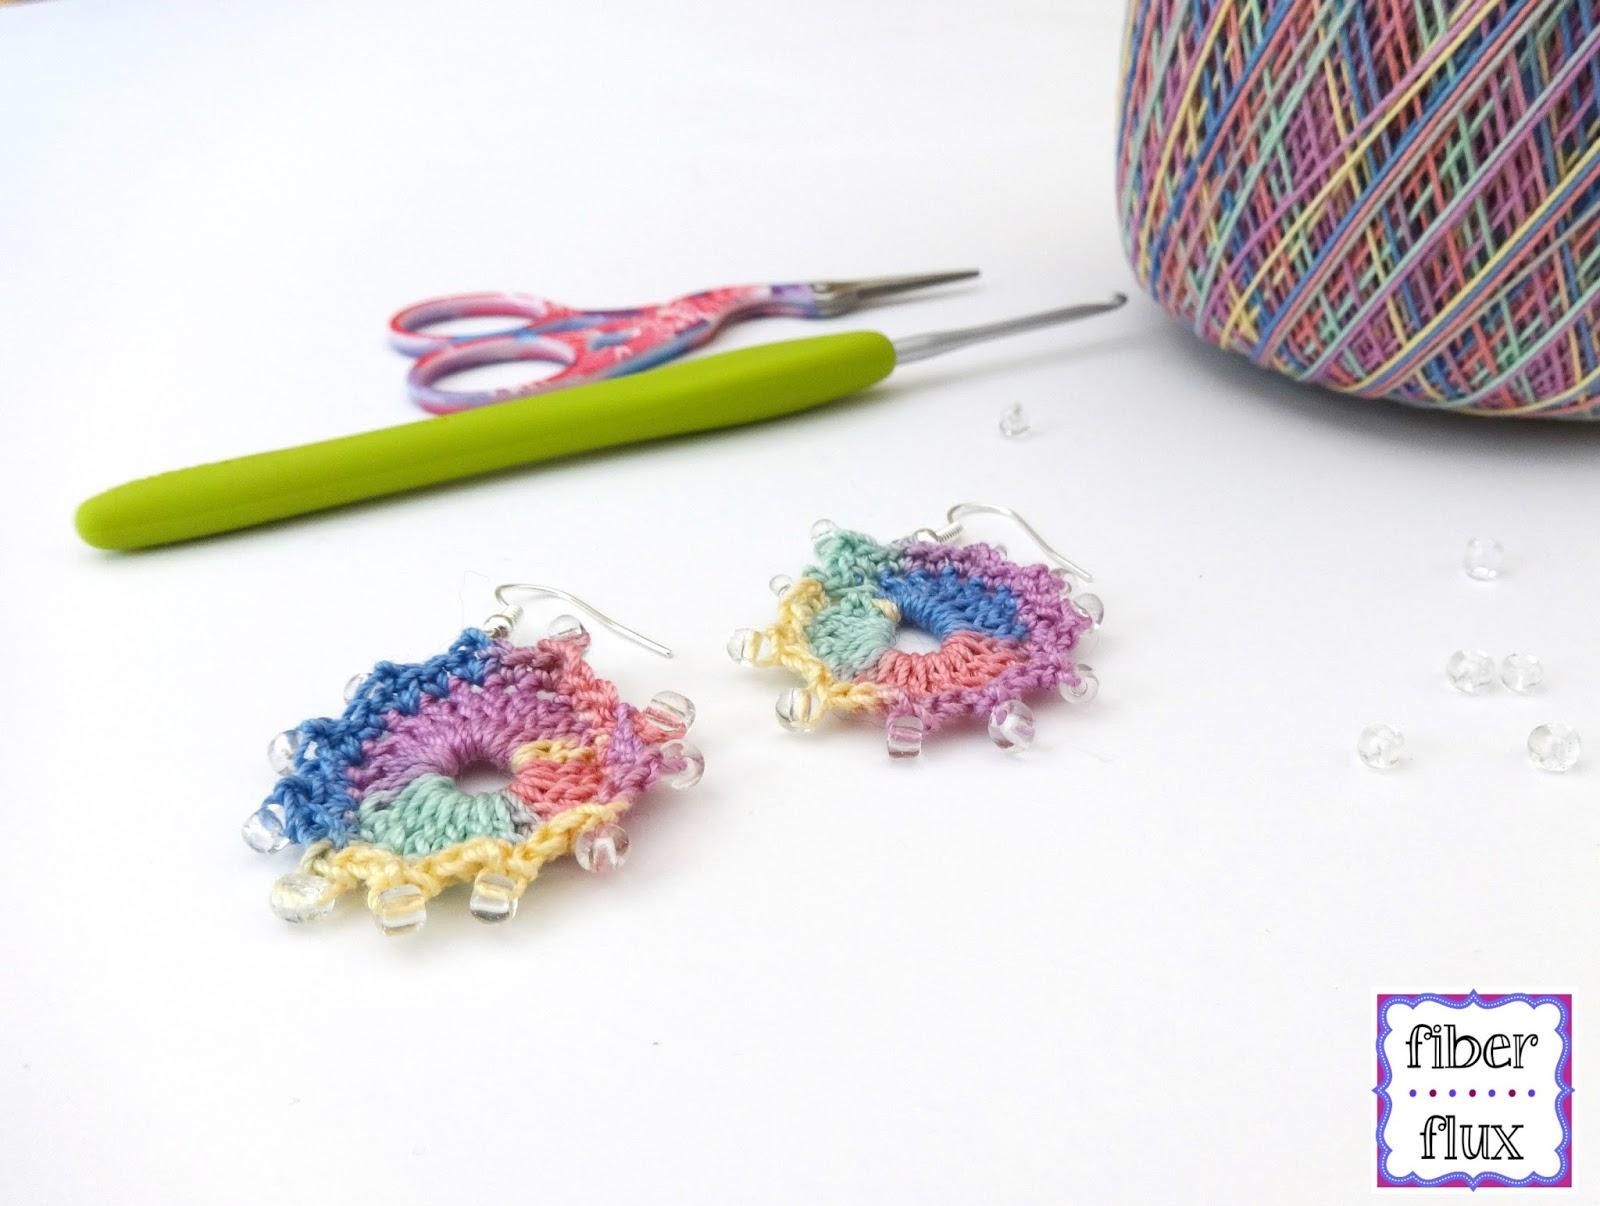 Fiber flux free crochet patternmmer sparkle earrings free crochet patternmmer sparkle earrings bankloansurffo Images